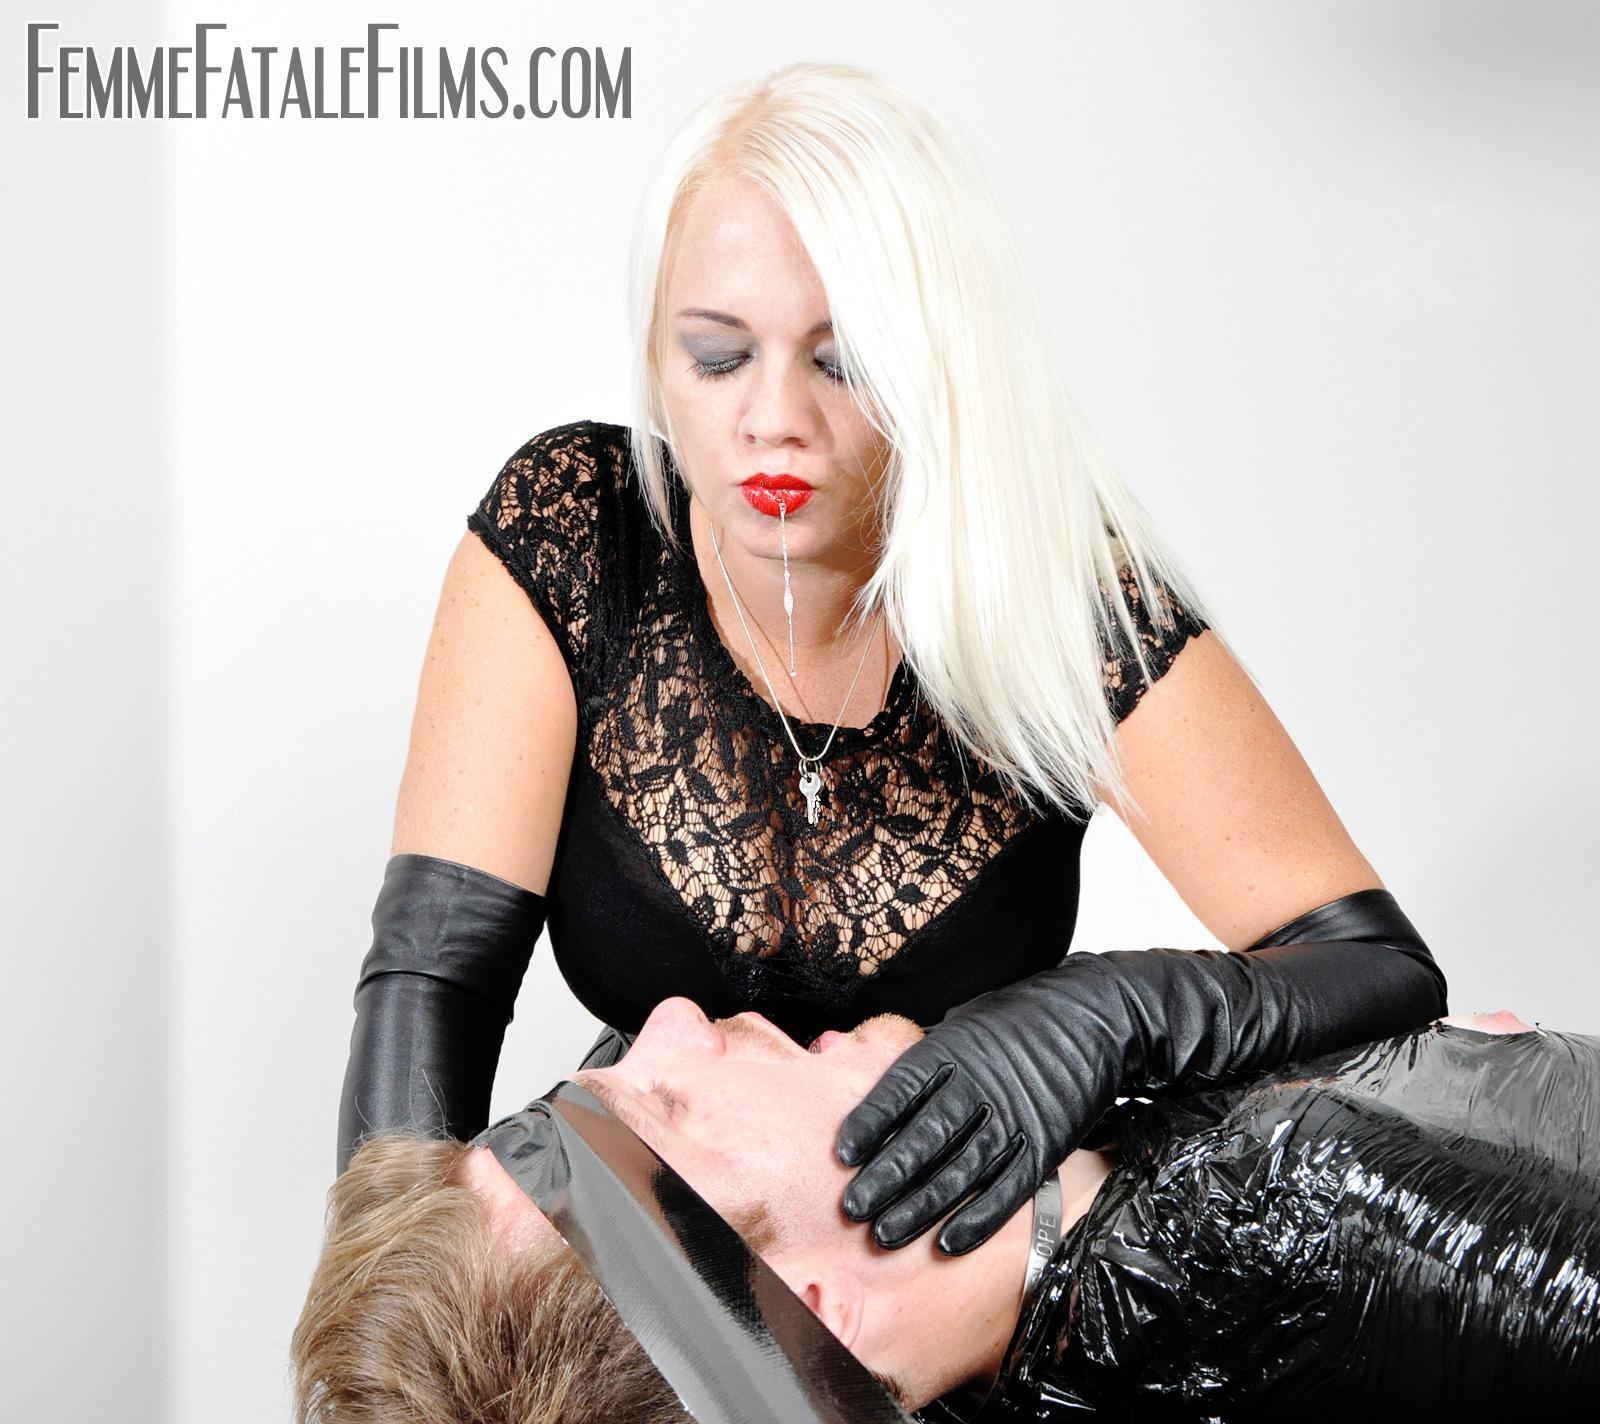 FemmeFataleFilms on Twitter: @Heather_Divine Giving a